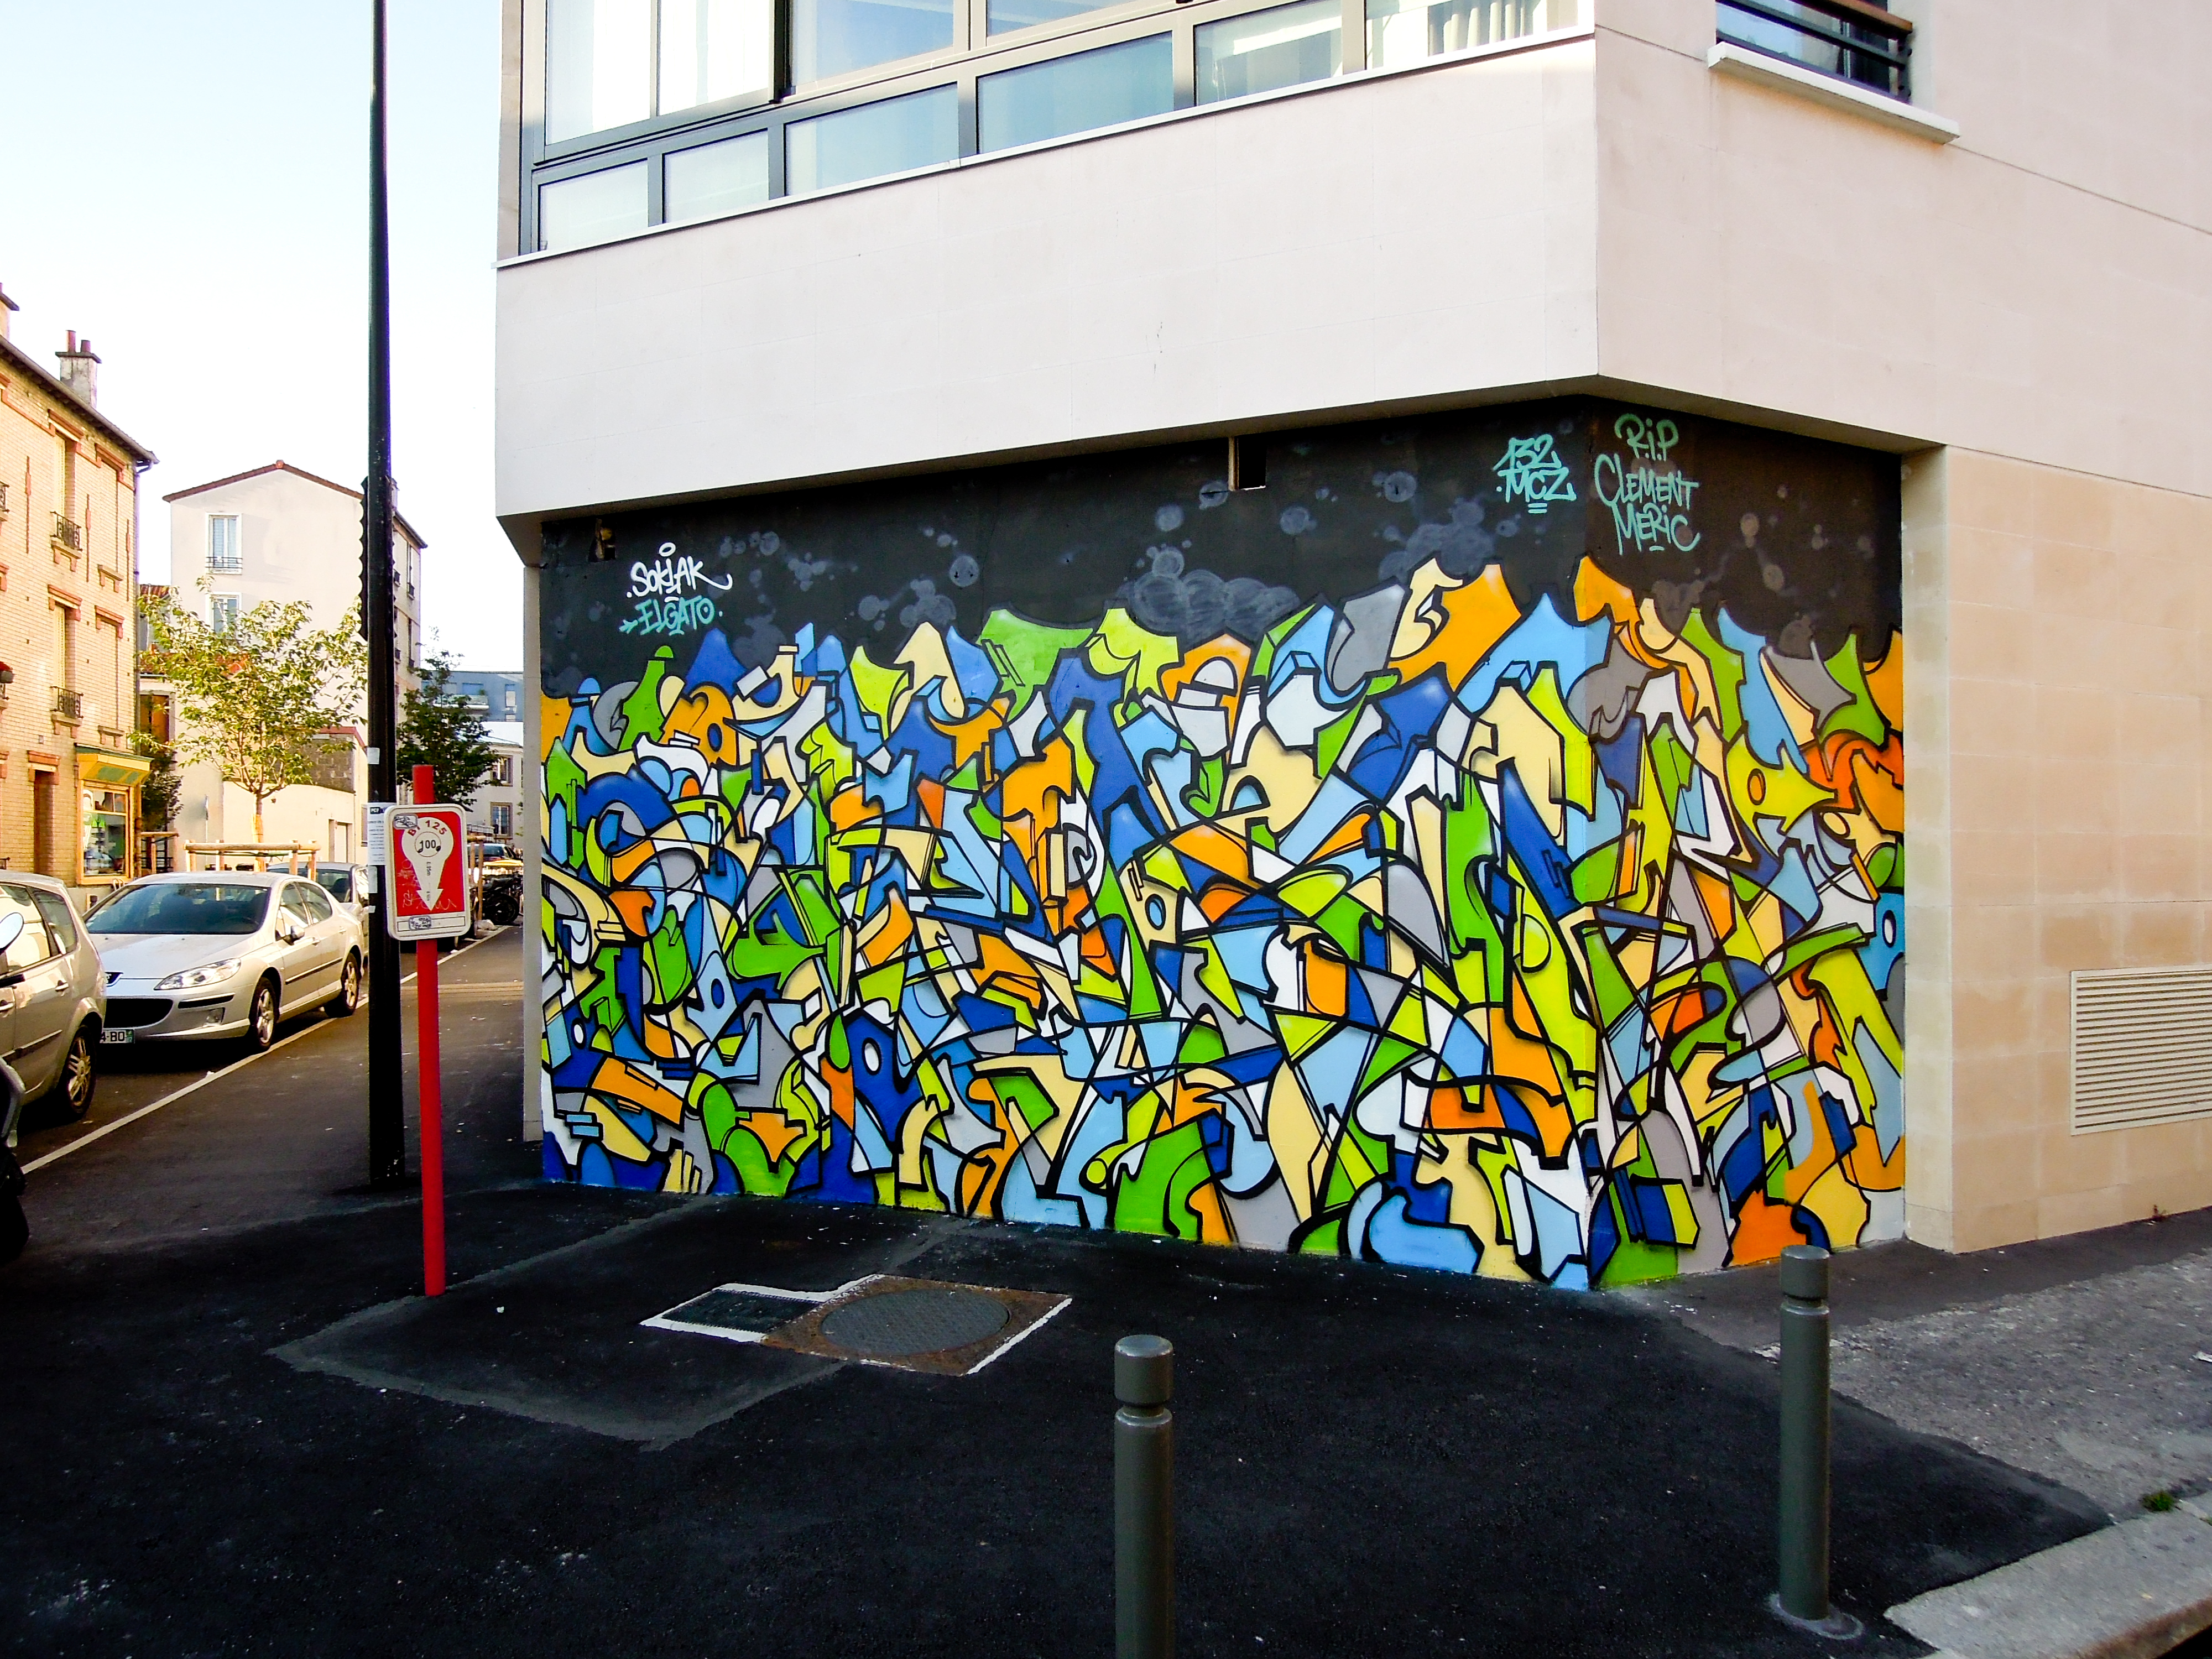 Soklak fresque street